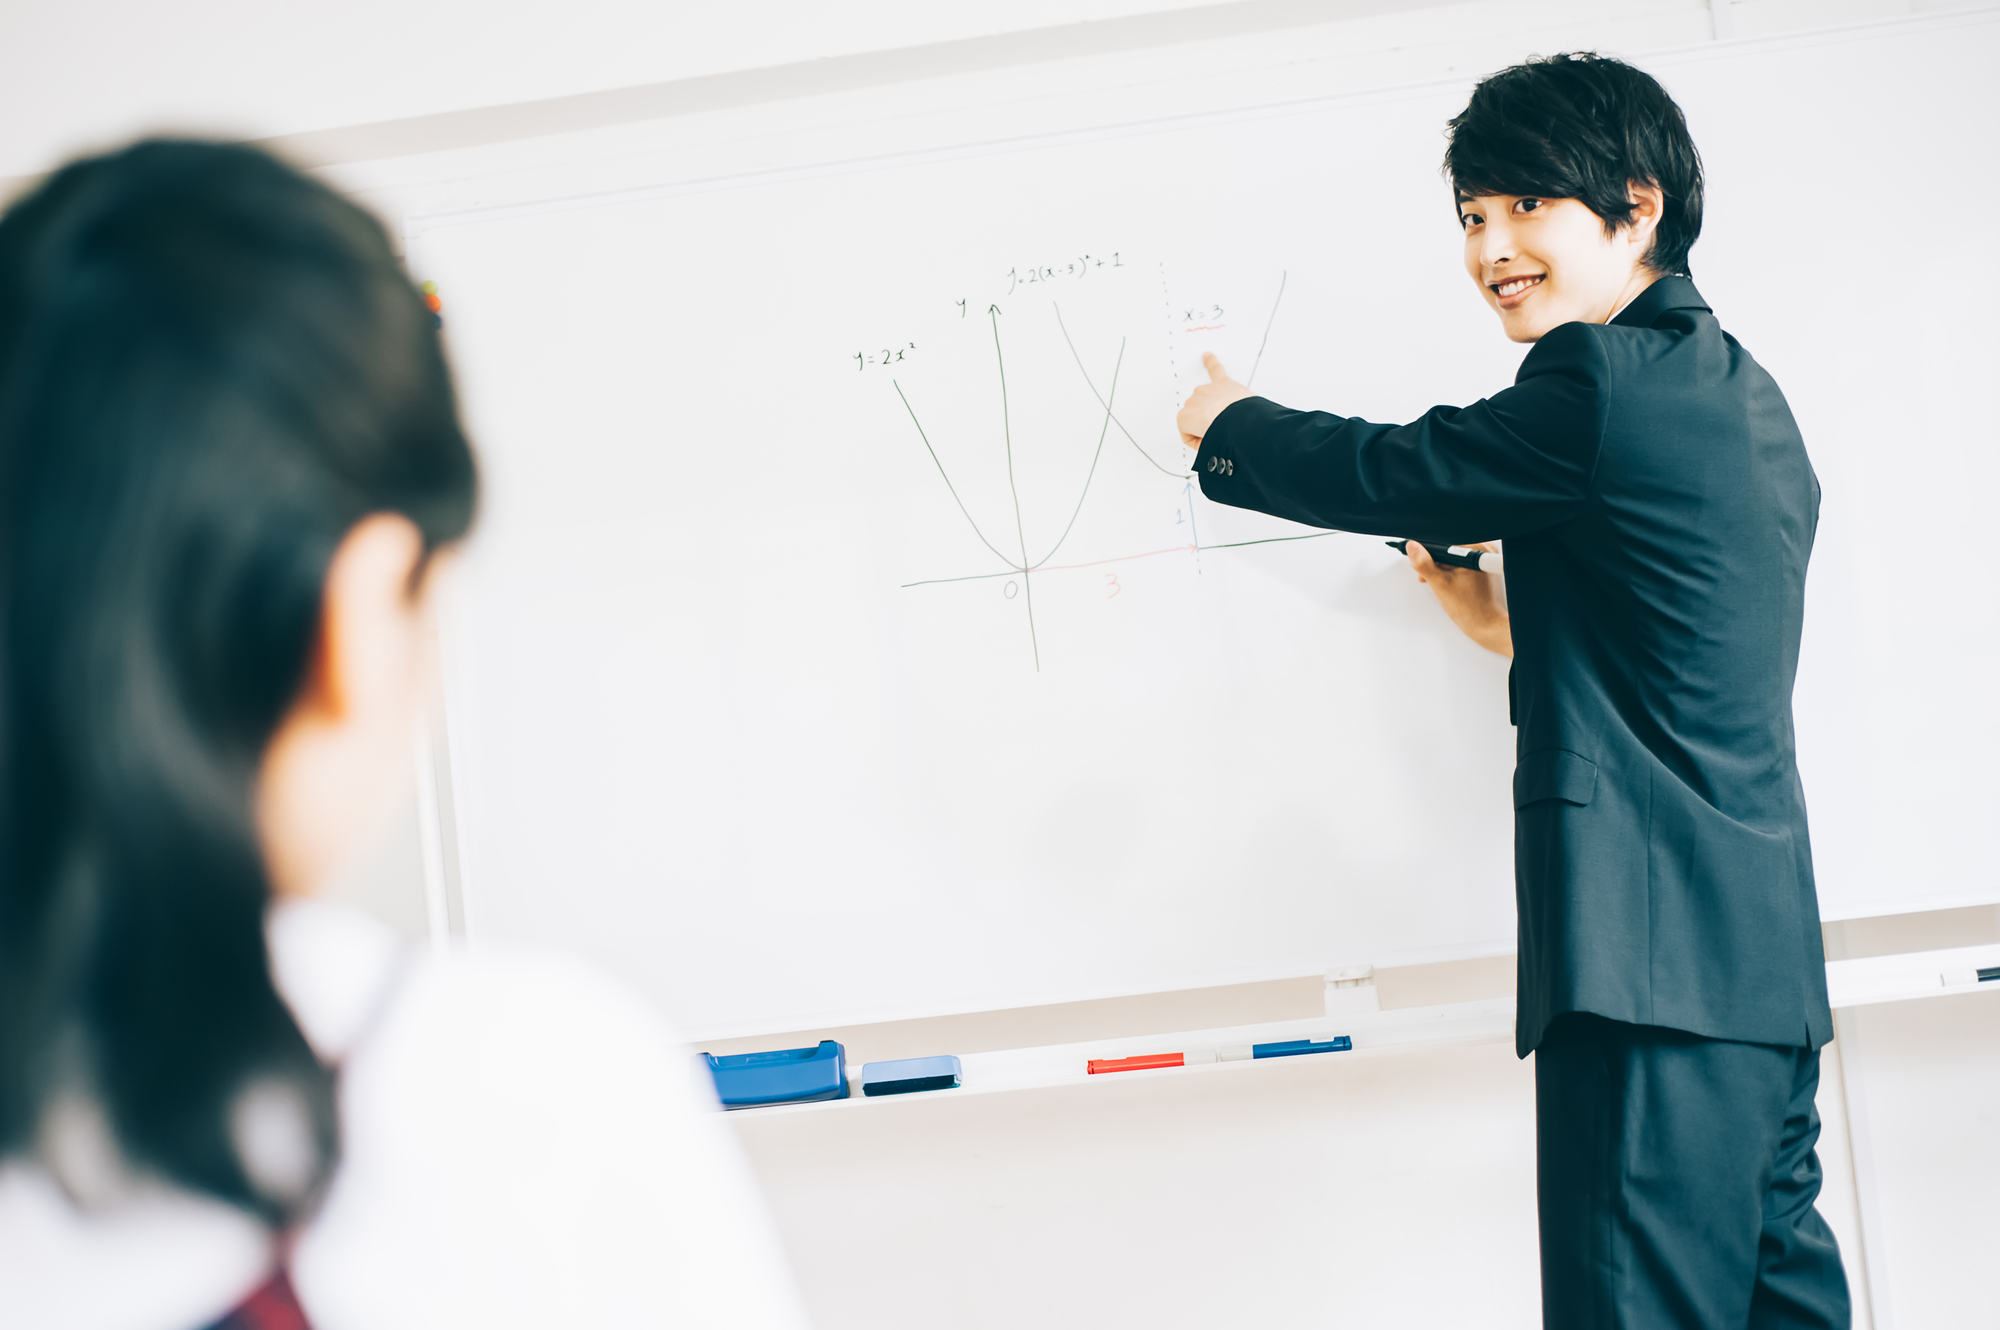 teacher_image